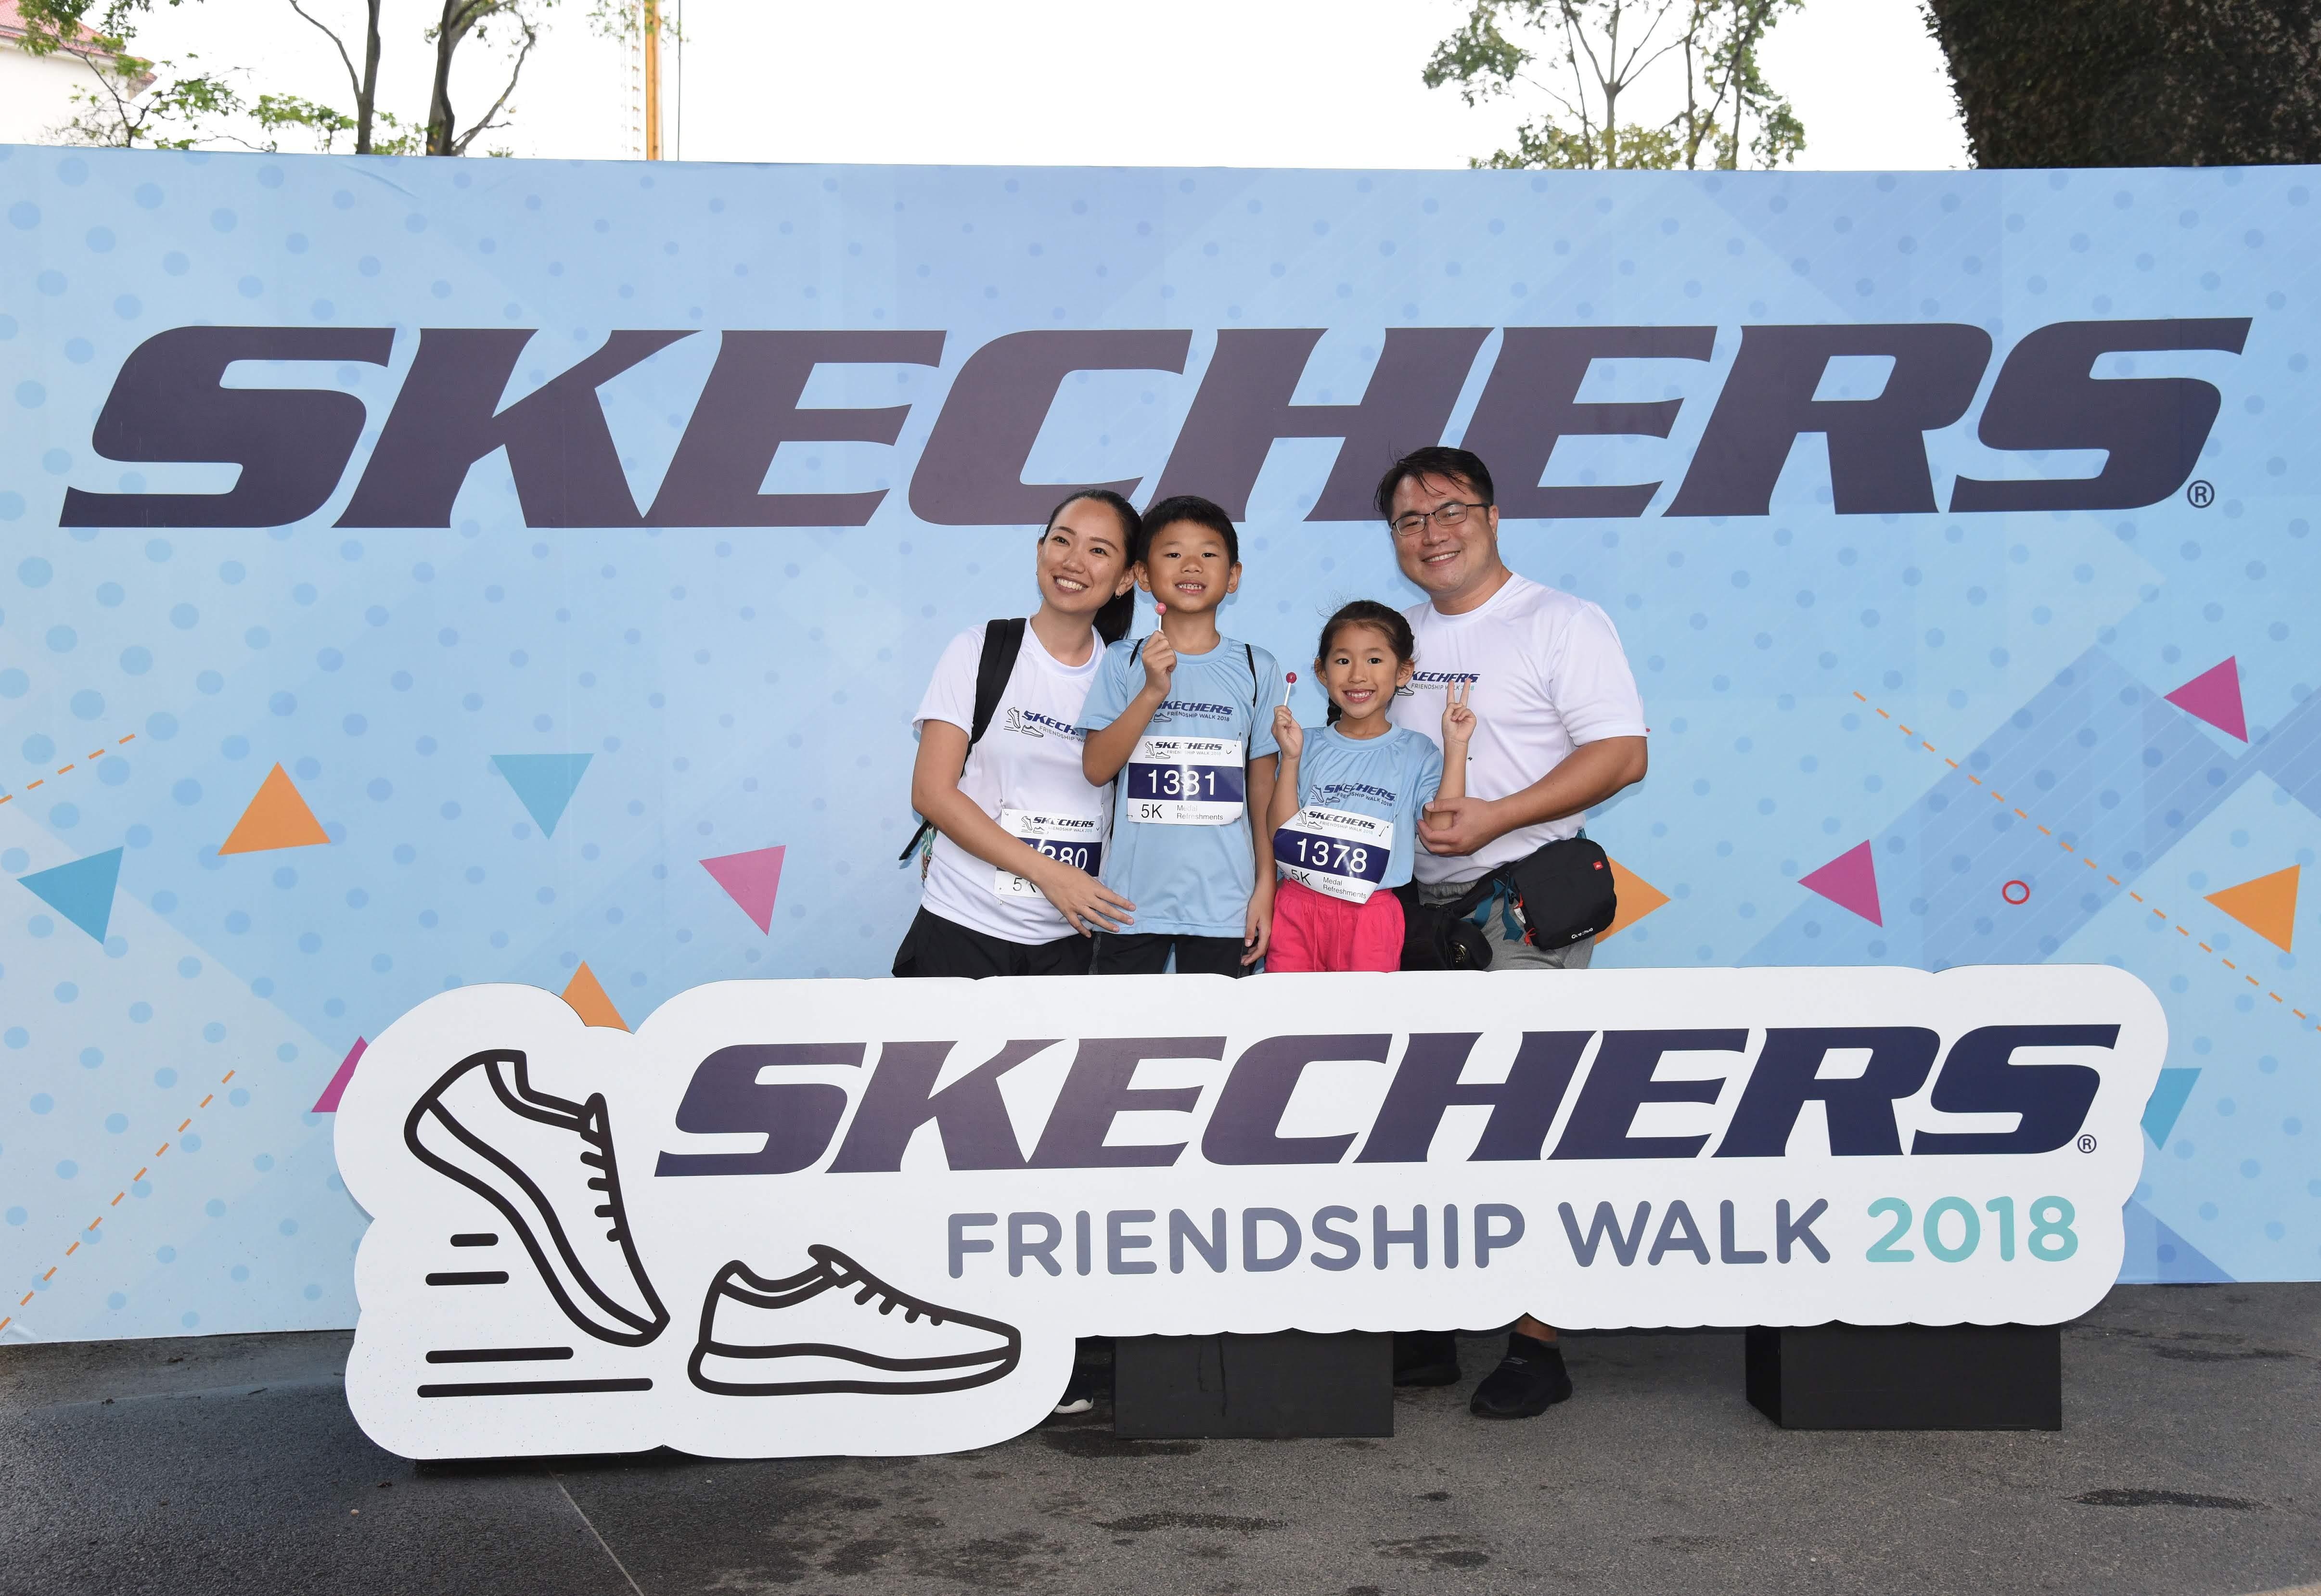 Skechers Friendship Walk 2018 Amazingly Still